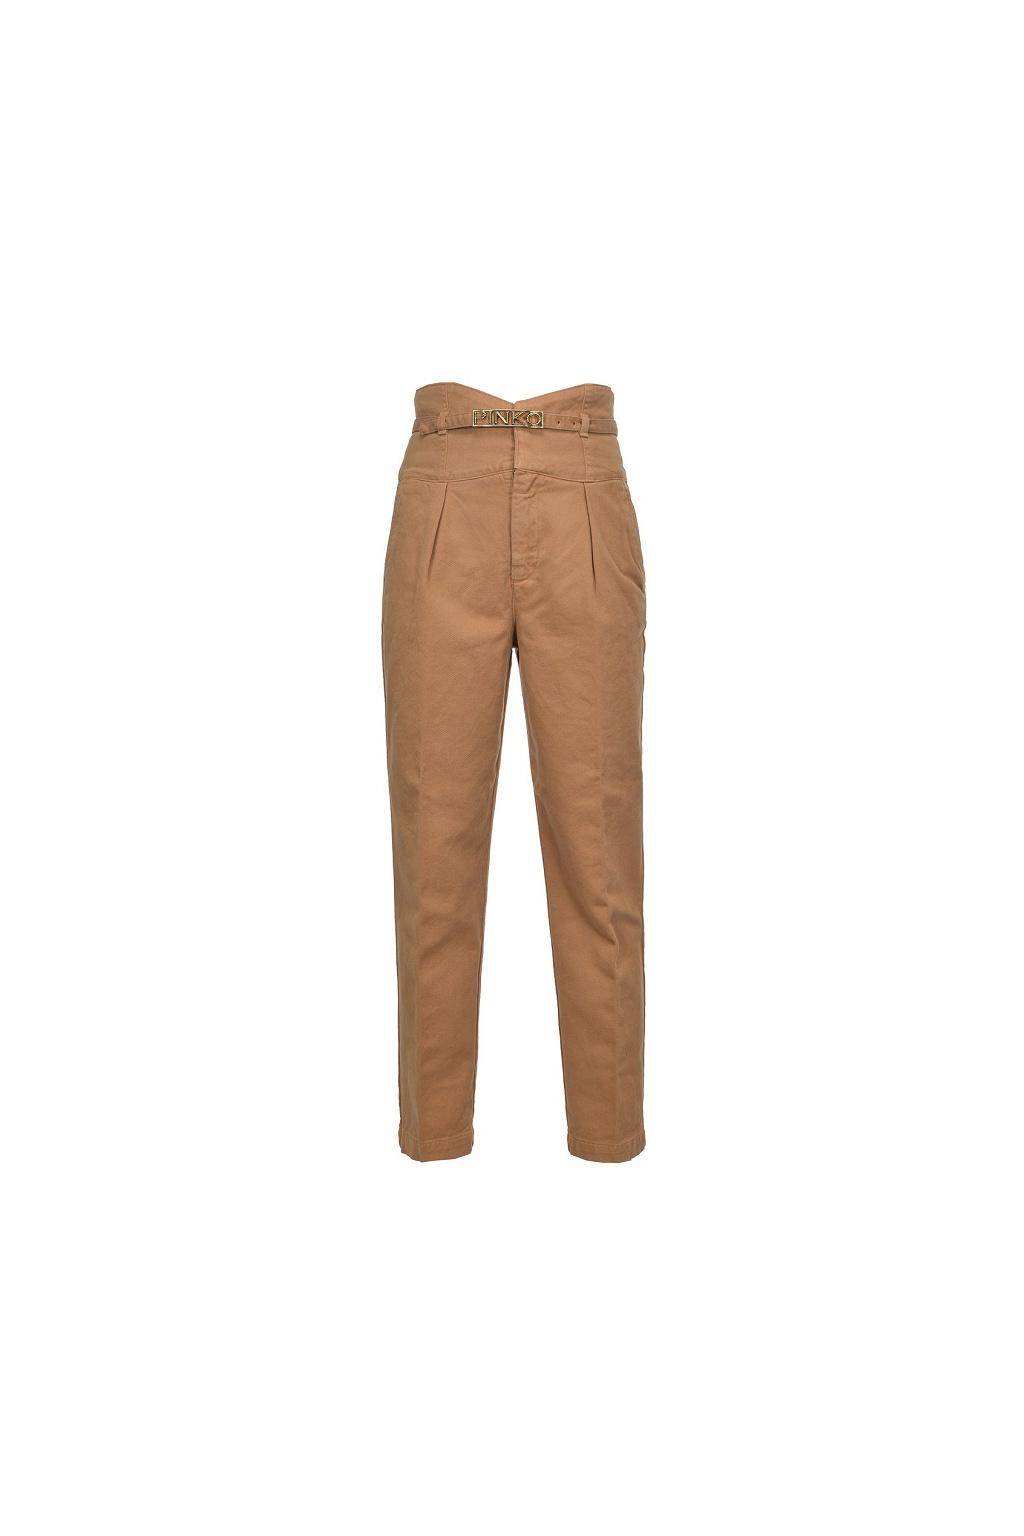 1J10J9Y6FH M07 Dámské kalhoty Pinko Ariel 5 Bustier PJ340B béžové